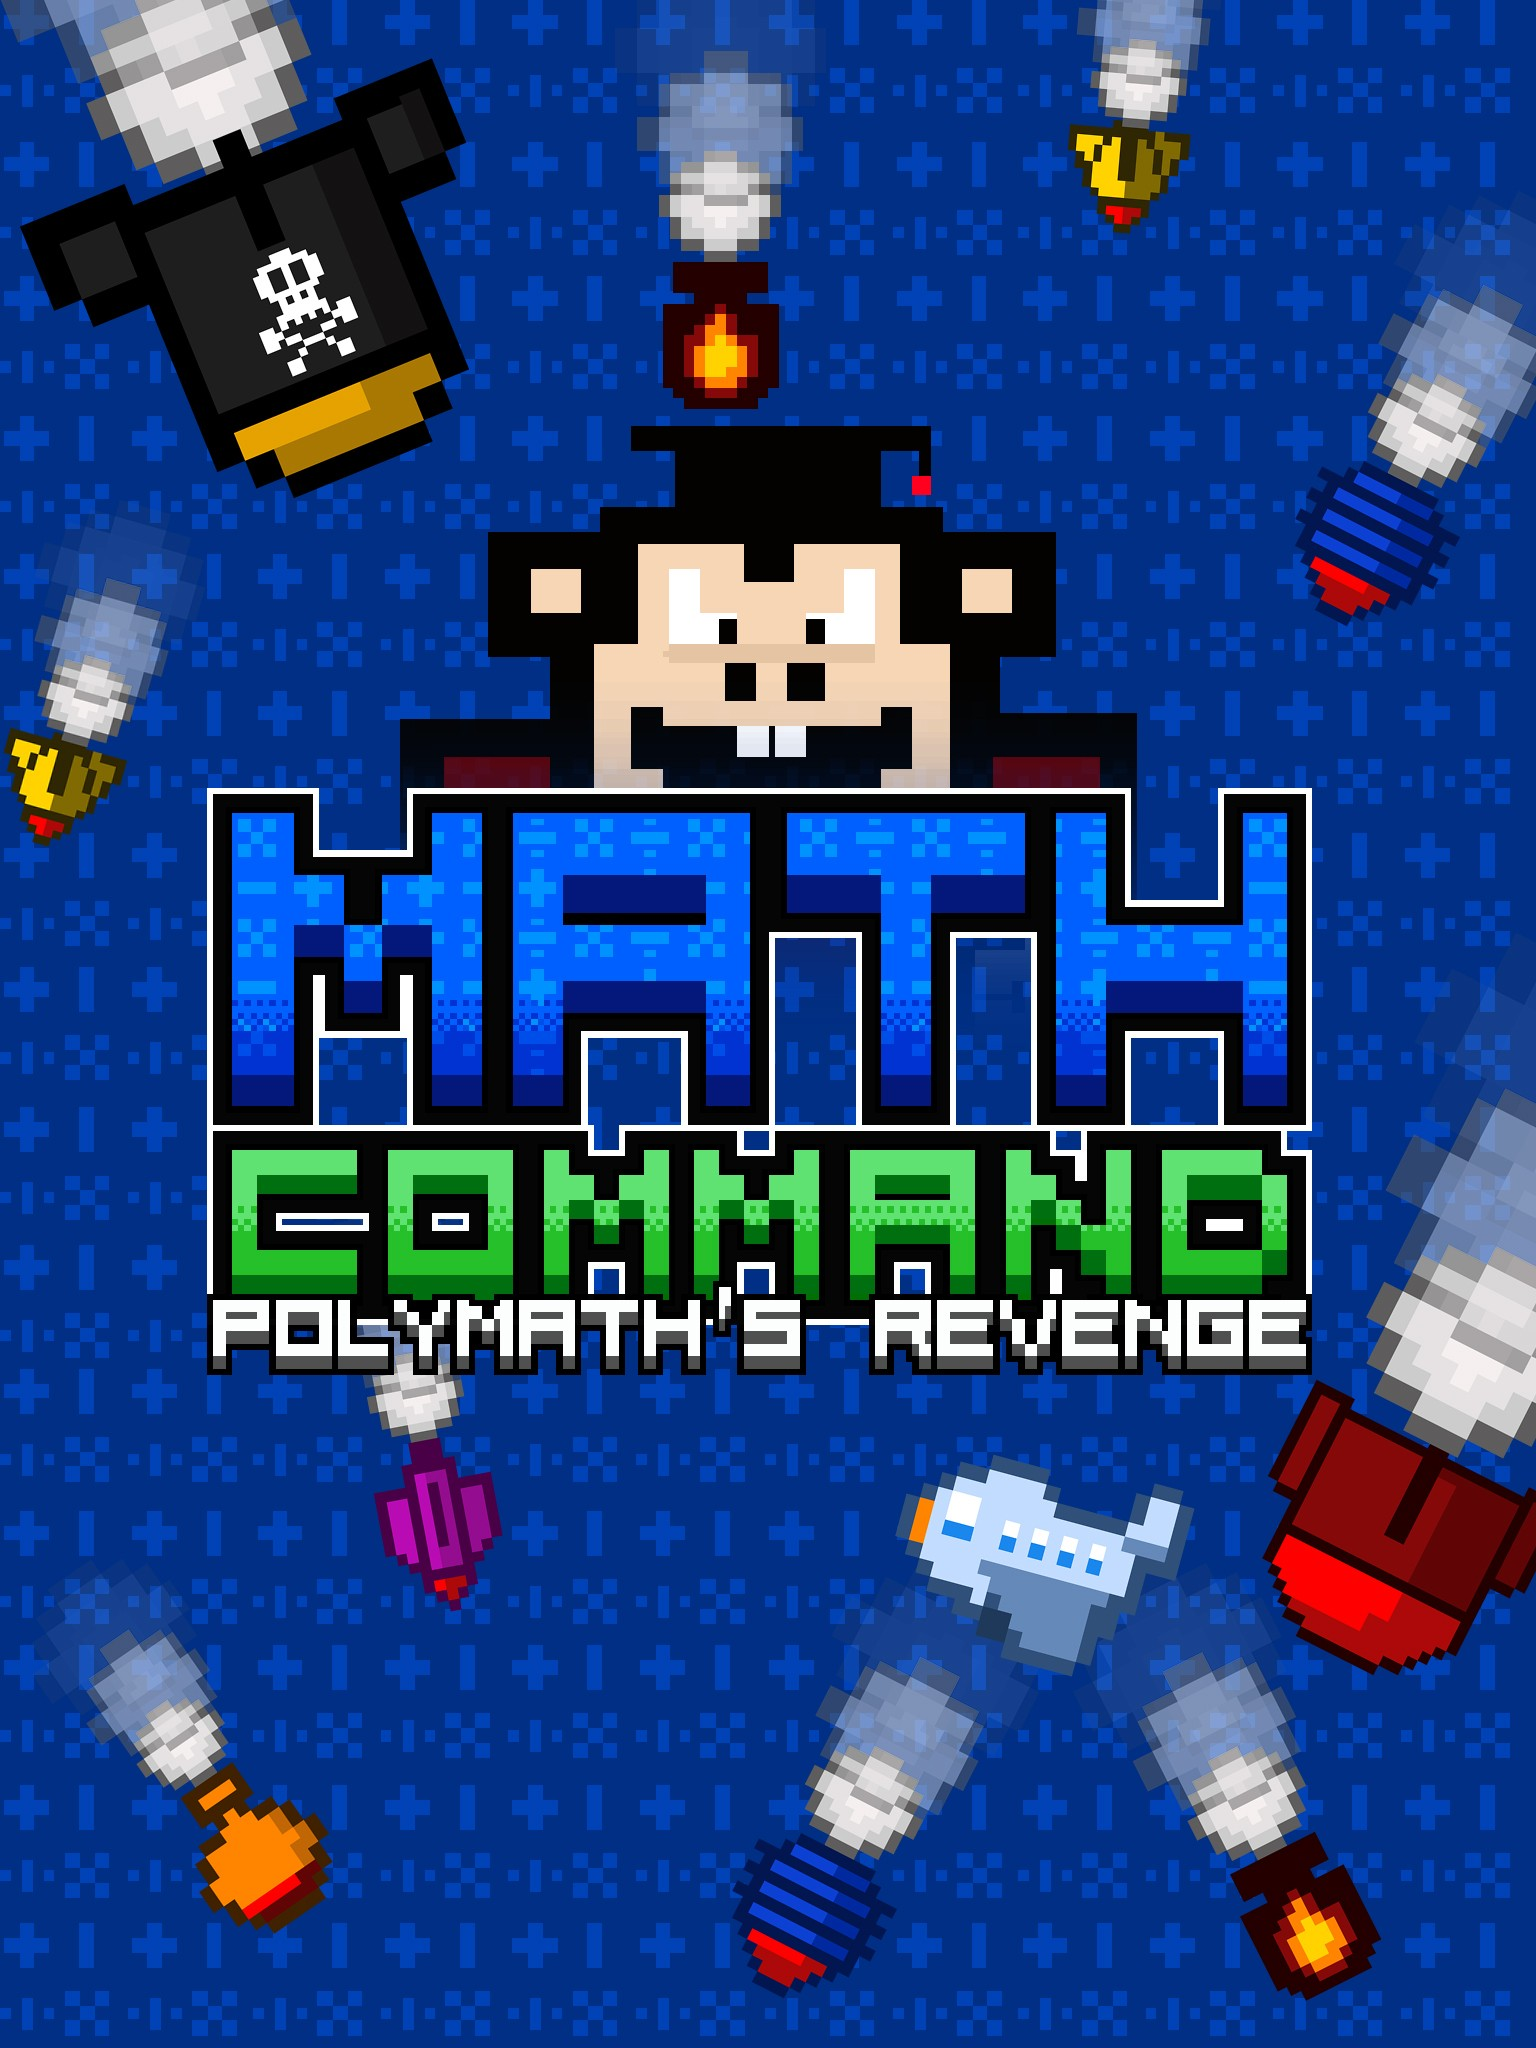 MATH COMMAND: POLYMATH'S REVENGE